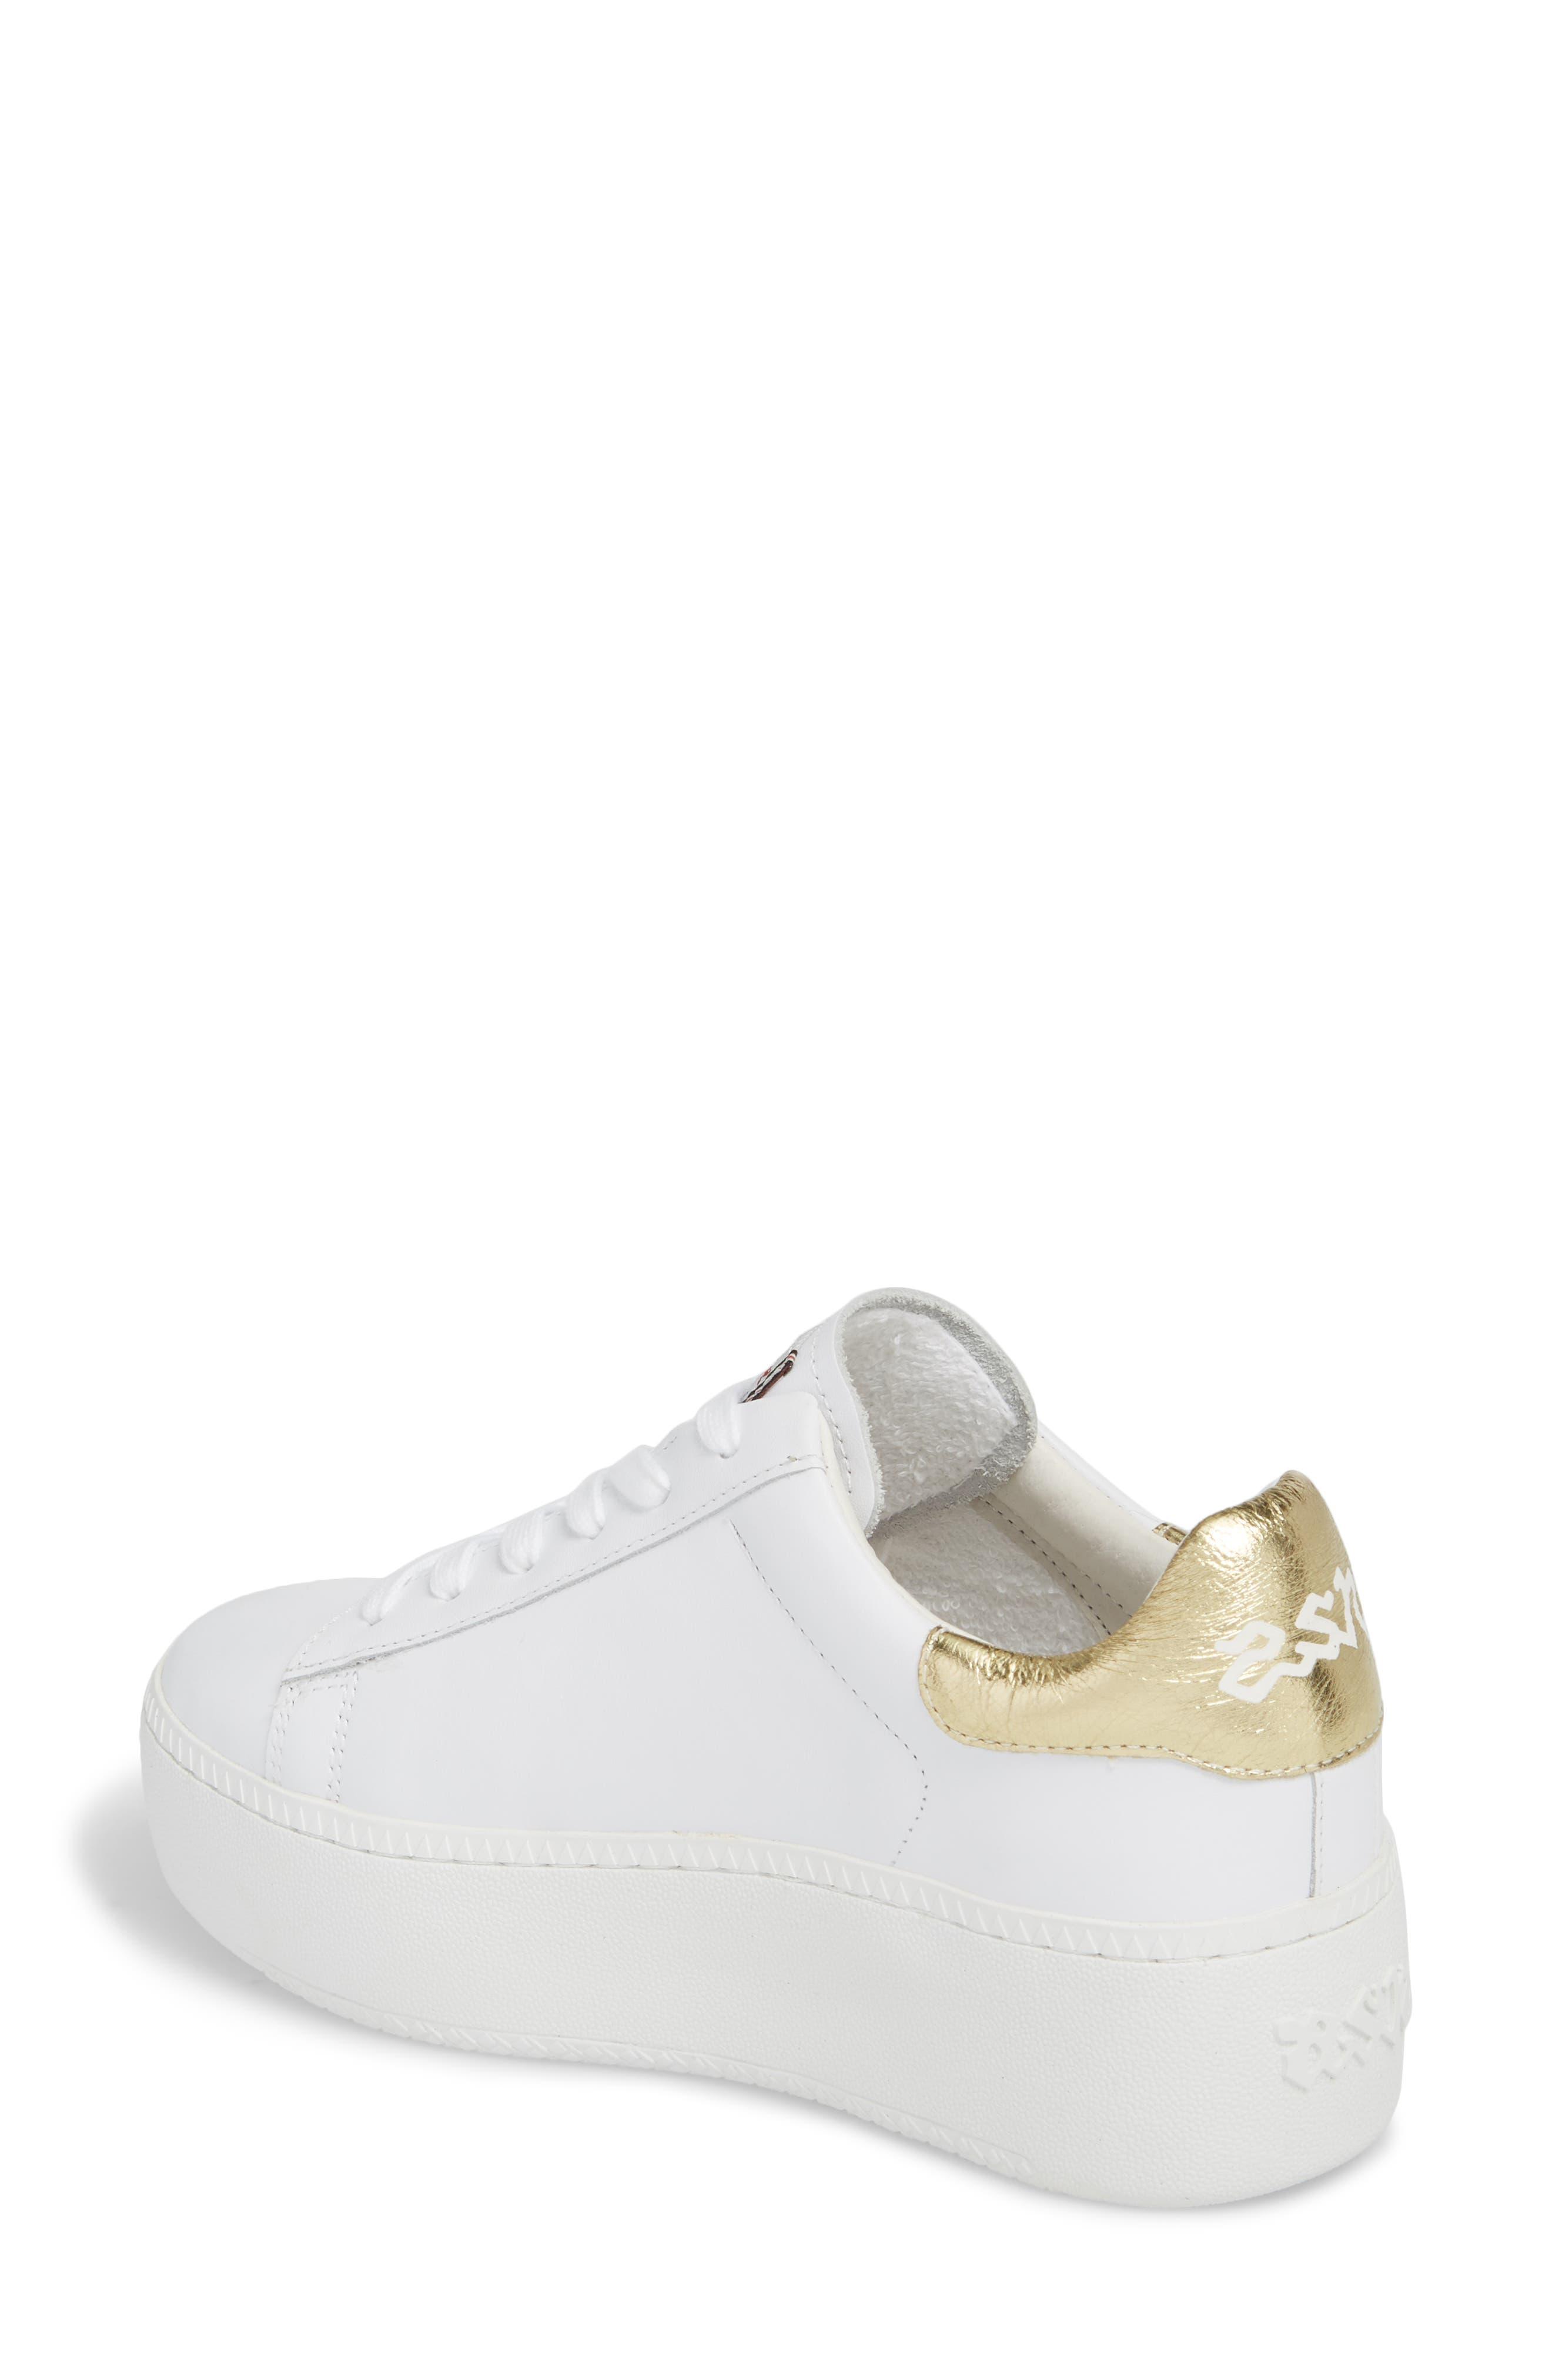 Cult Platform Sneaker,                             Alternate thumbnail 2, color,                             White/ Ariel